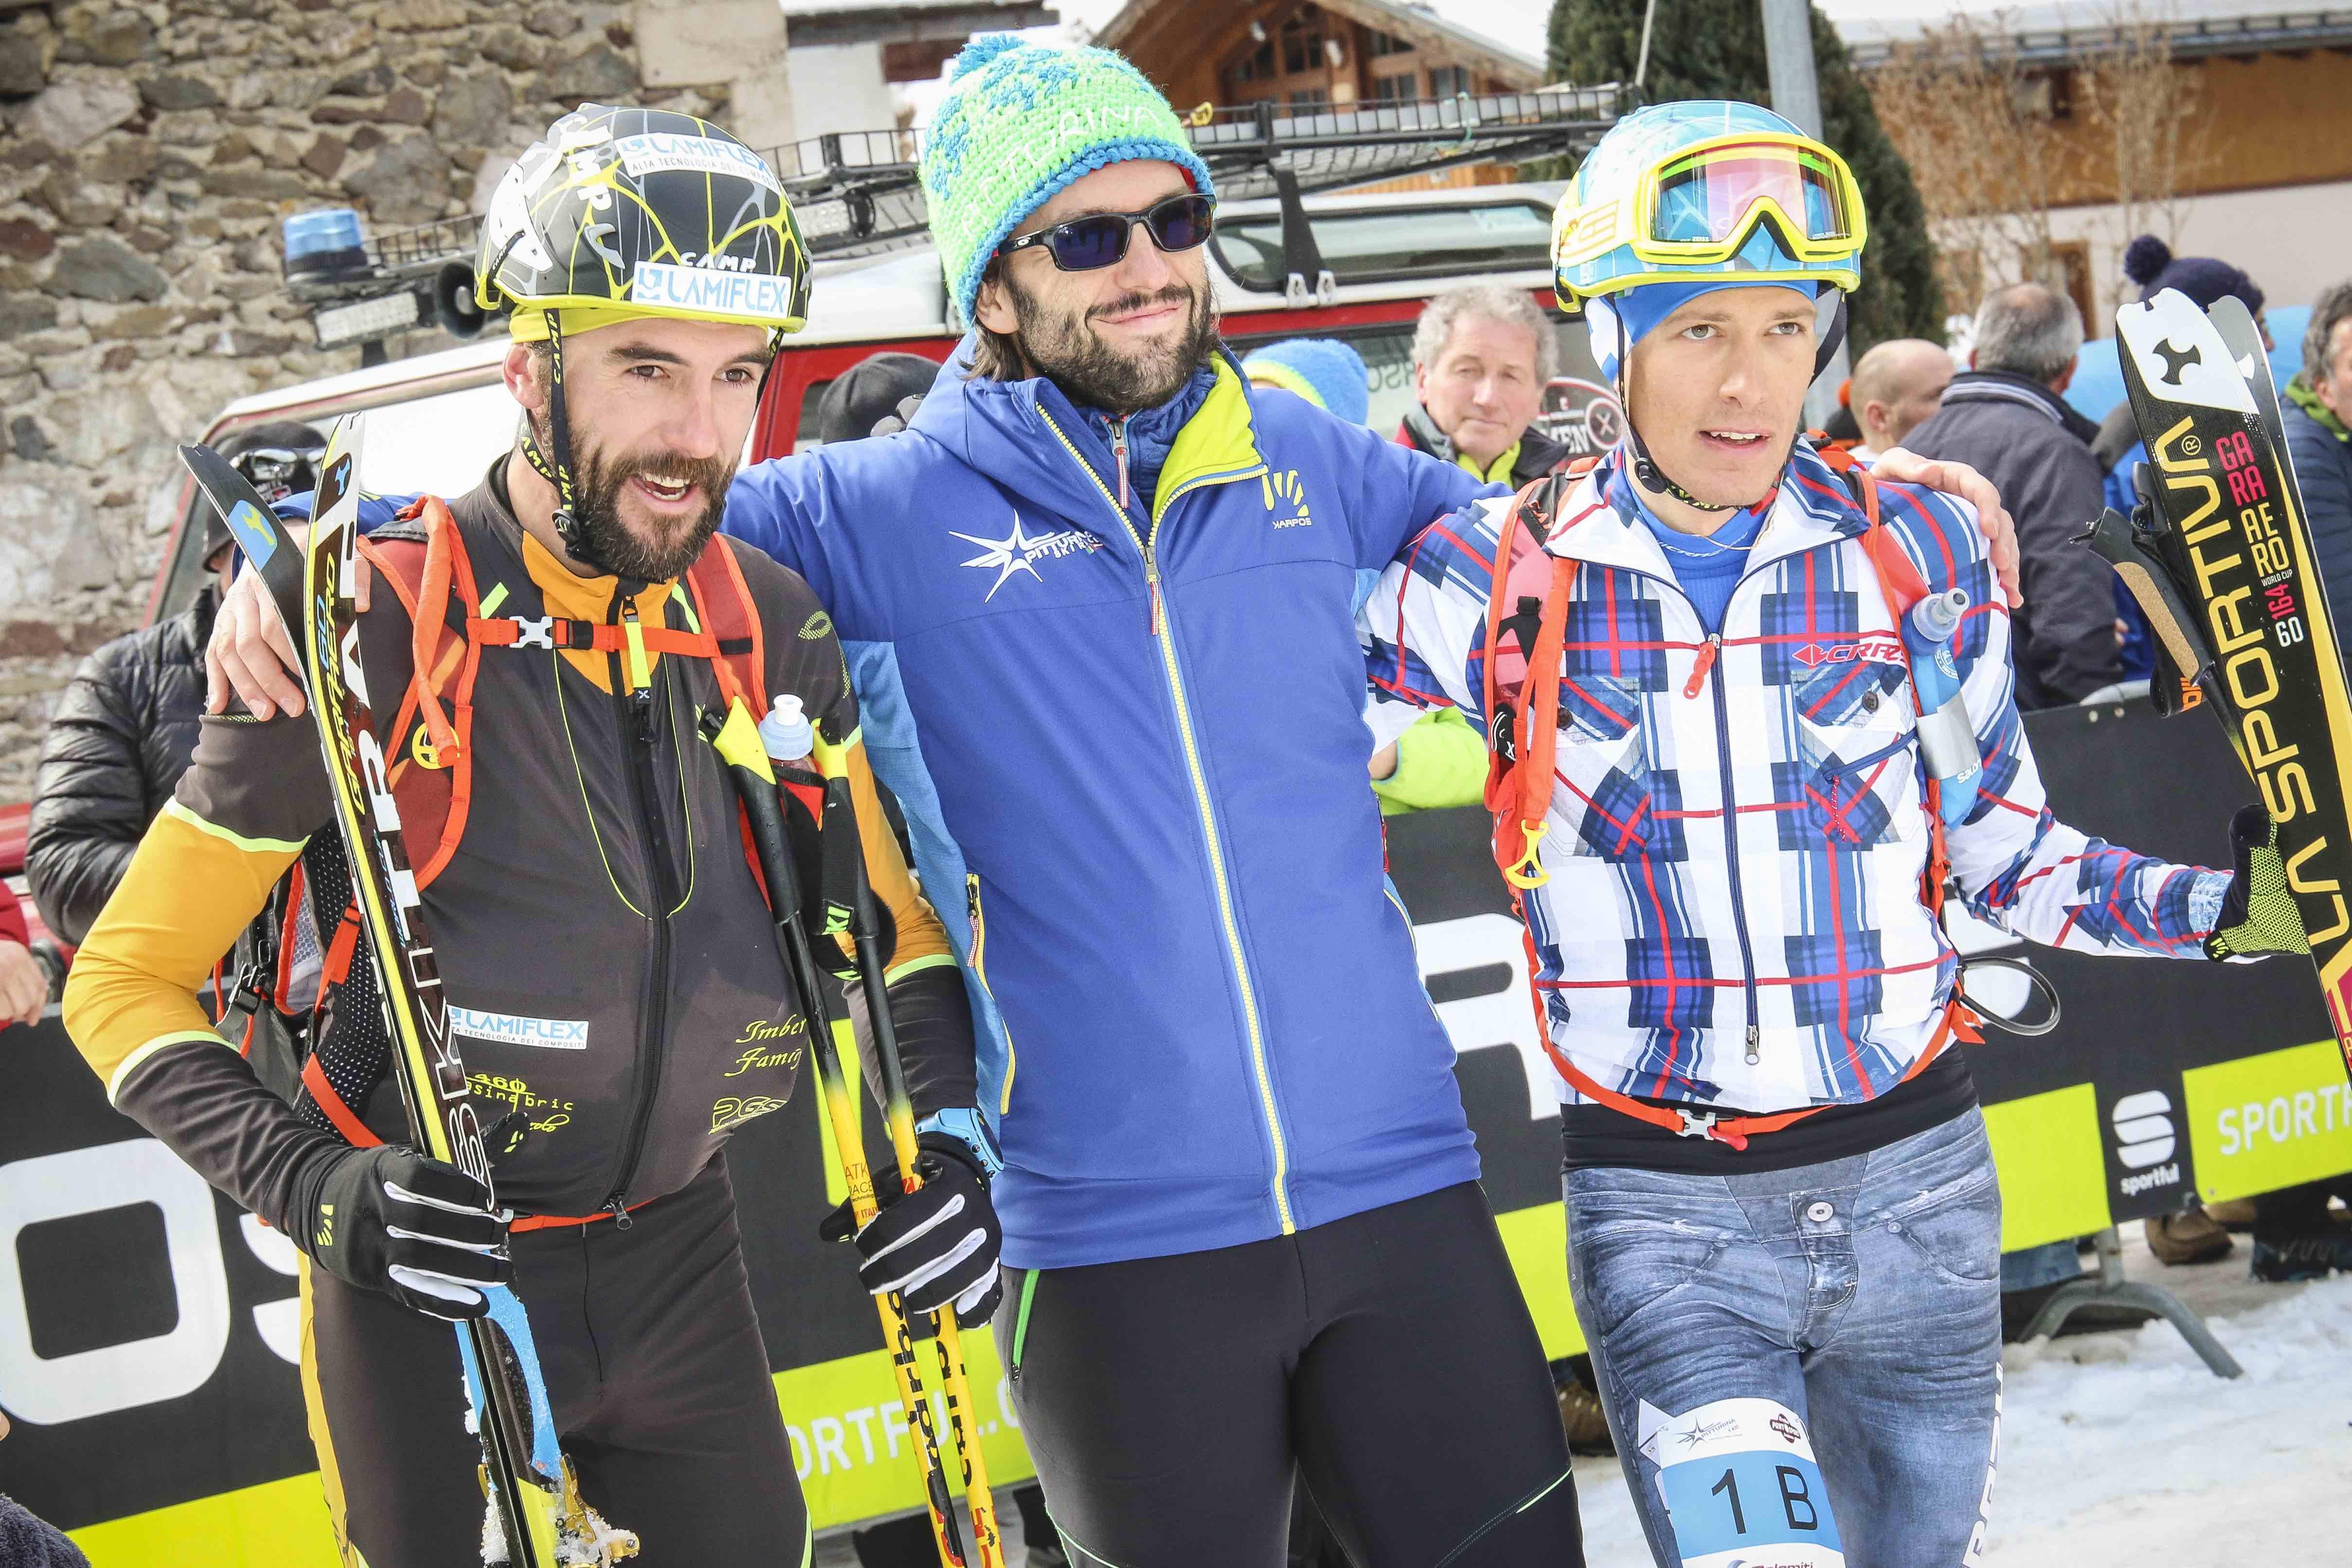 I vincitori della Pitturina Ski Race 2018